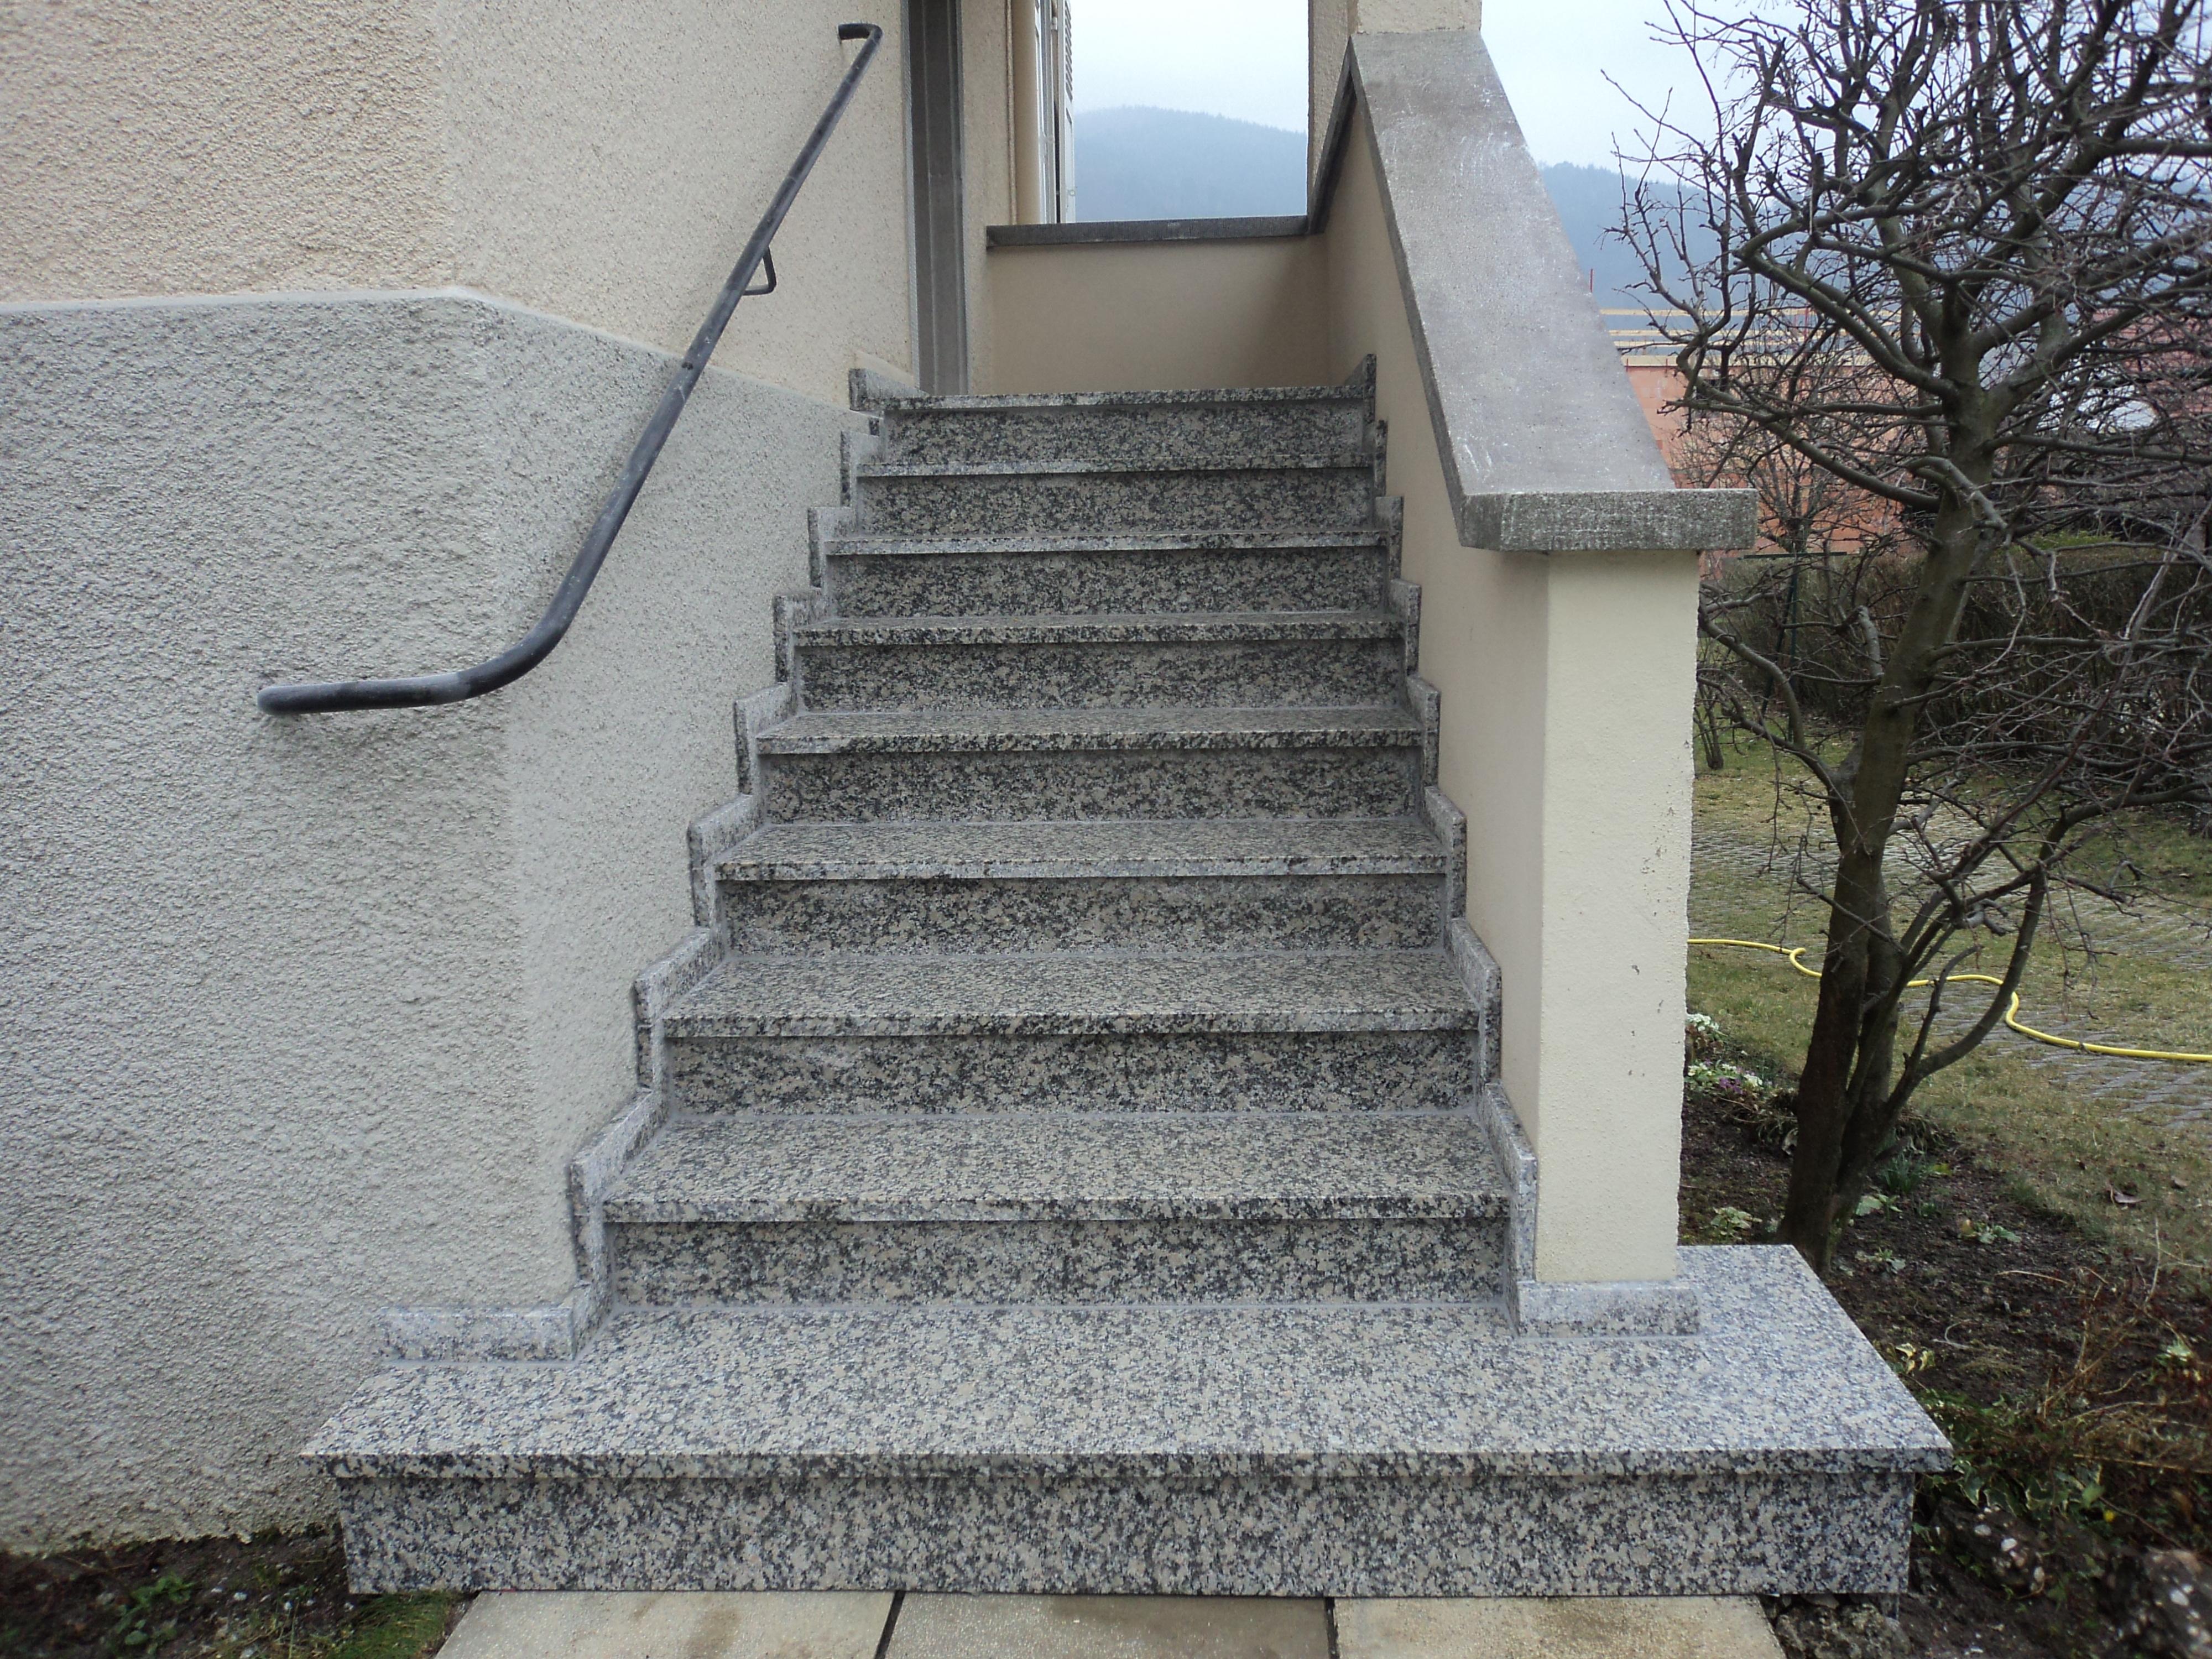 escalier granit heimsbrunn, galfingue, spechbach, hochstatt